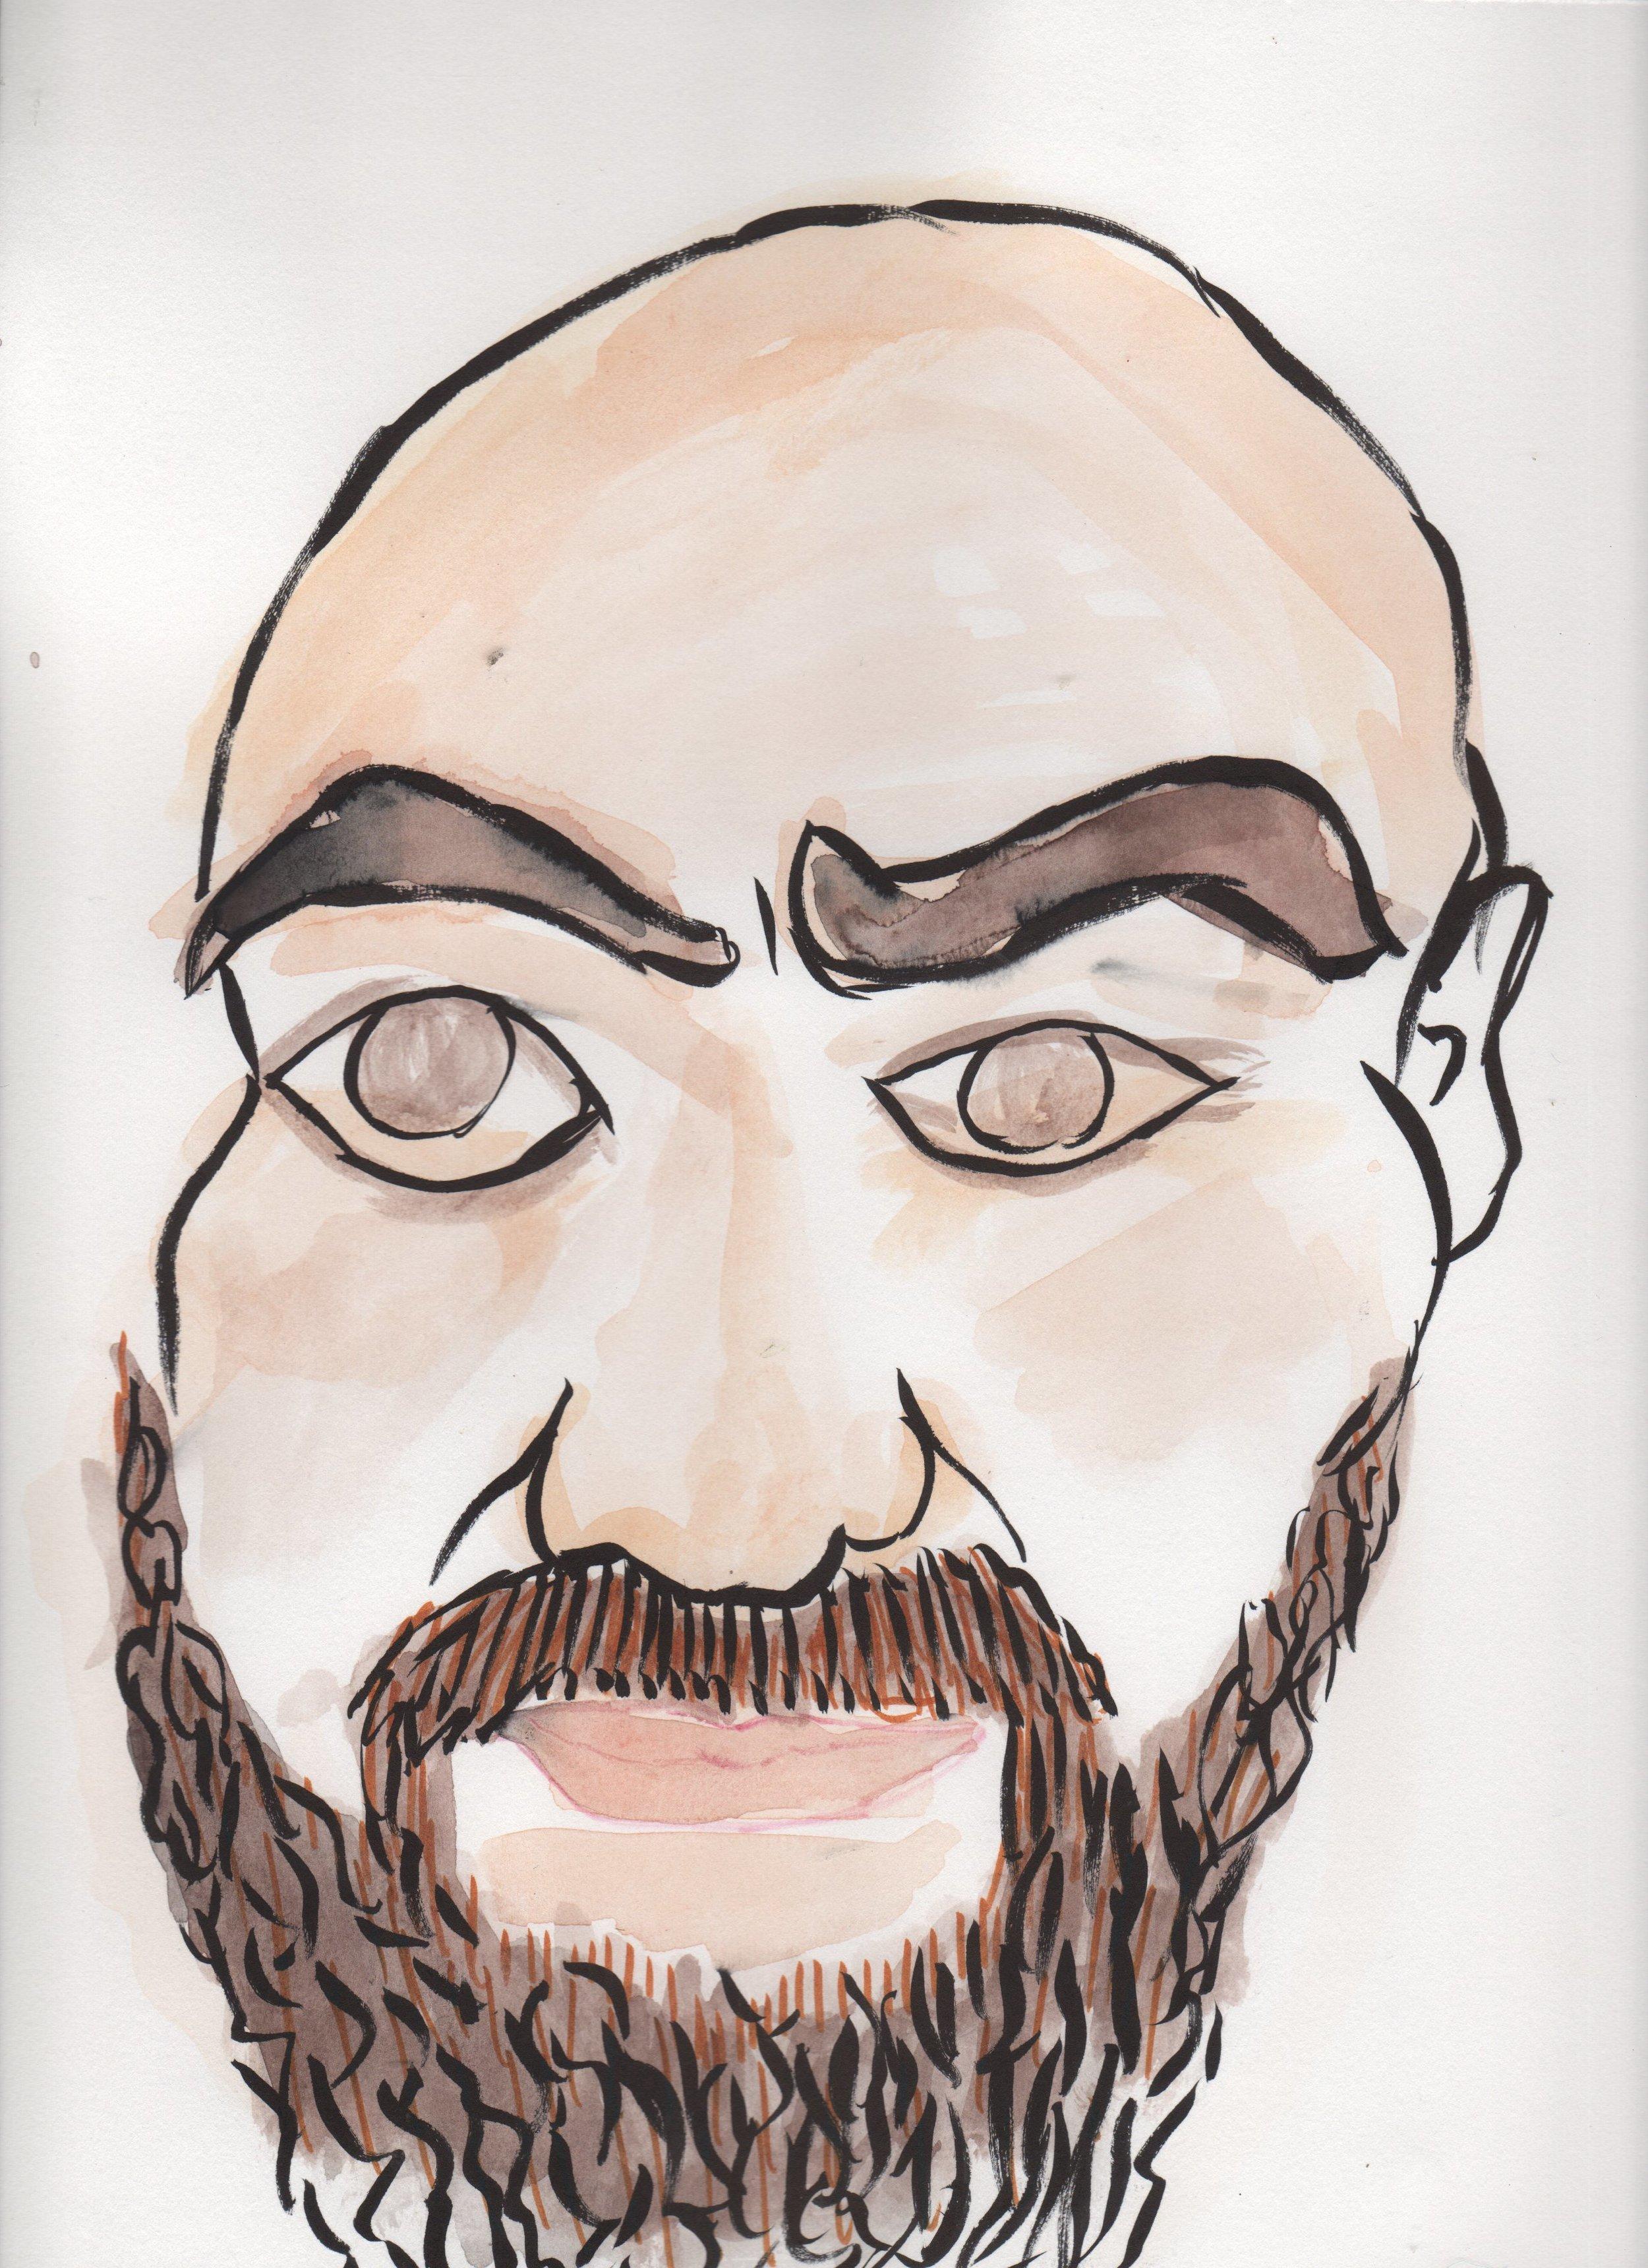 caricature003.jpg